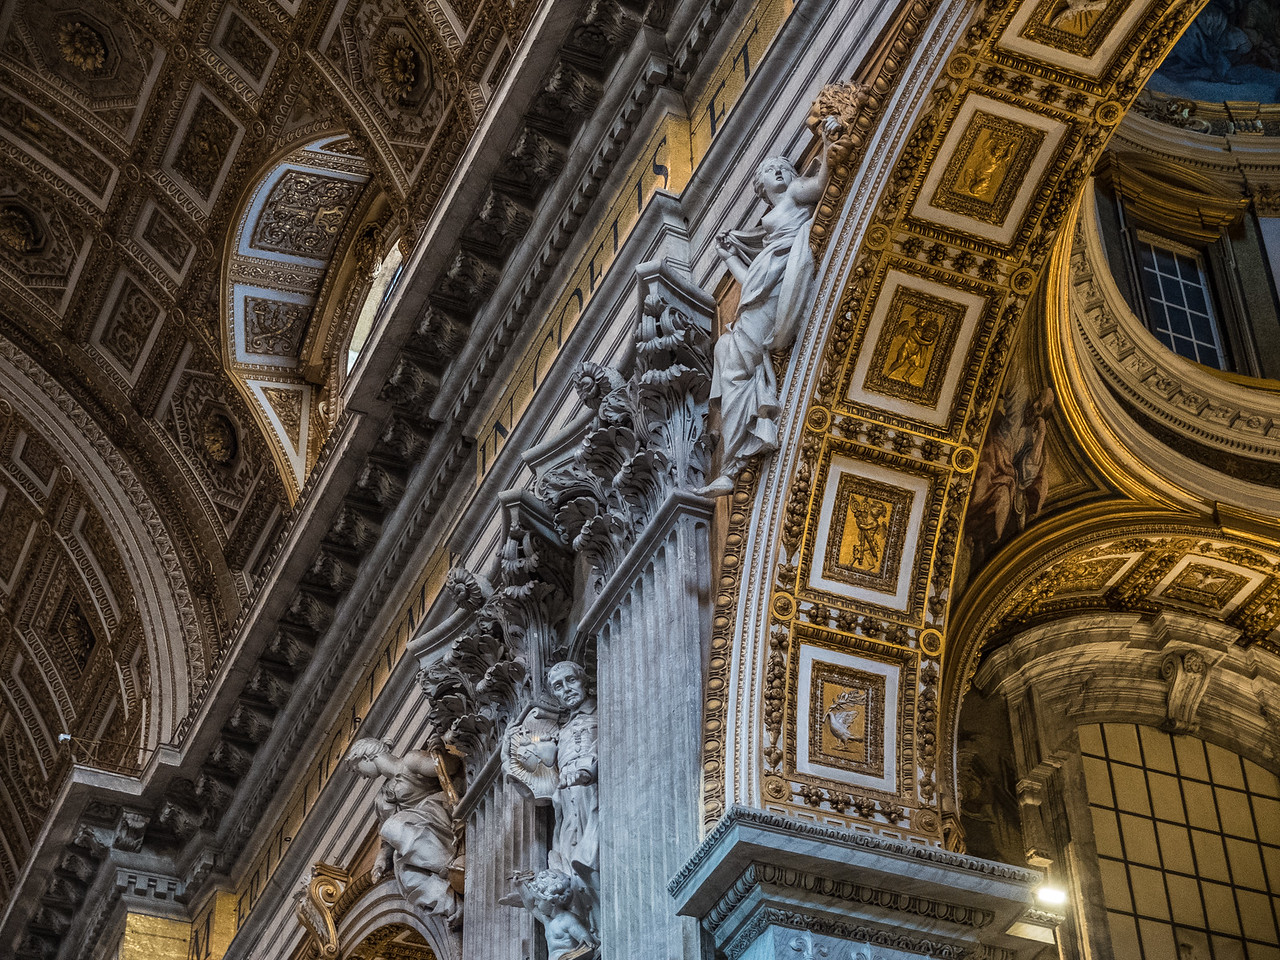 St. Peter's Basilica, Vatican, Rome, Italy